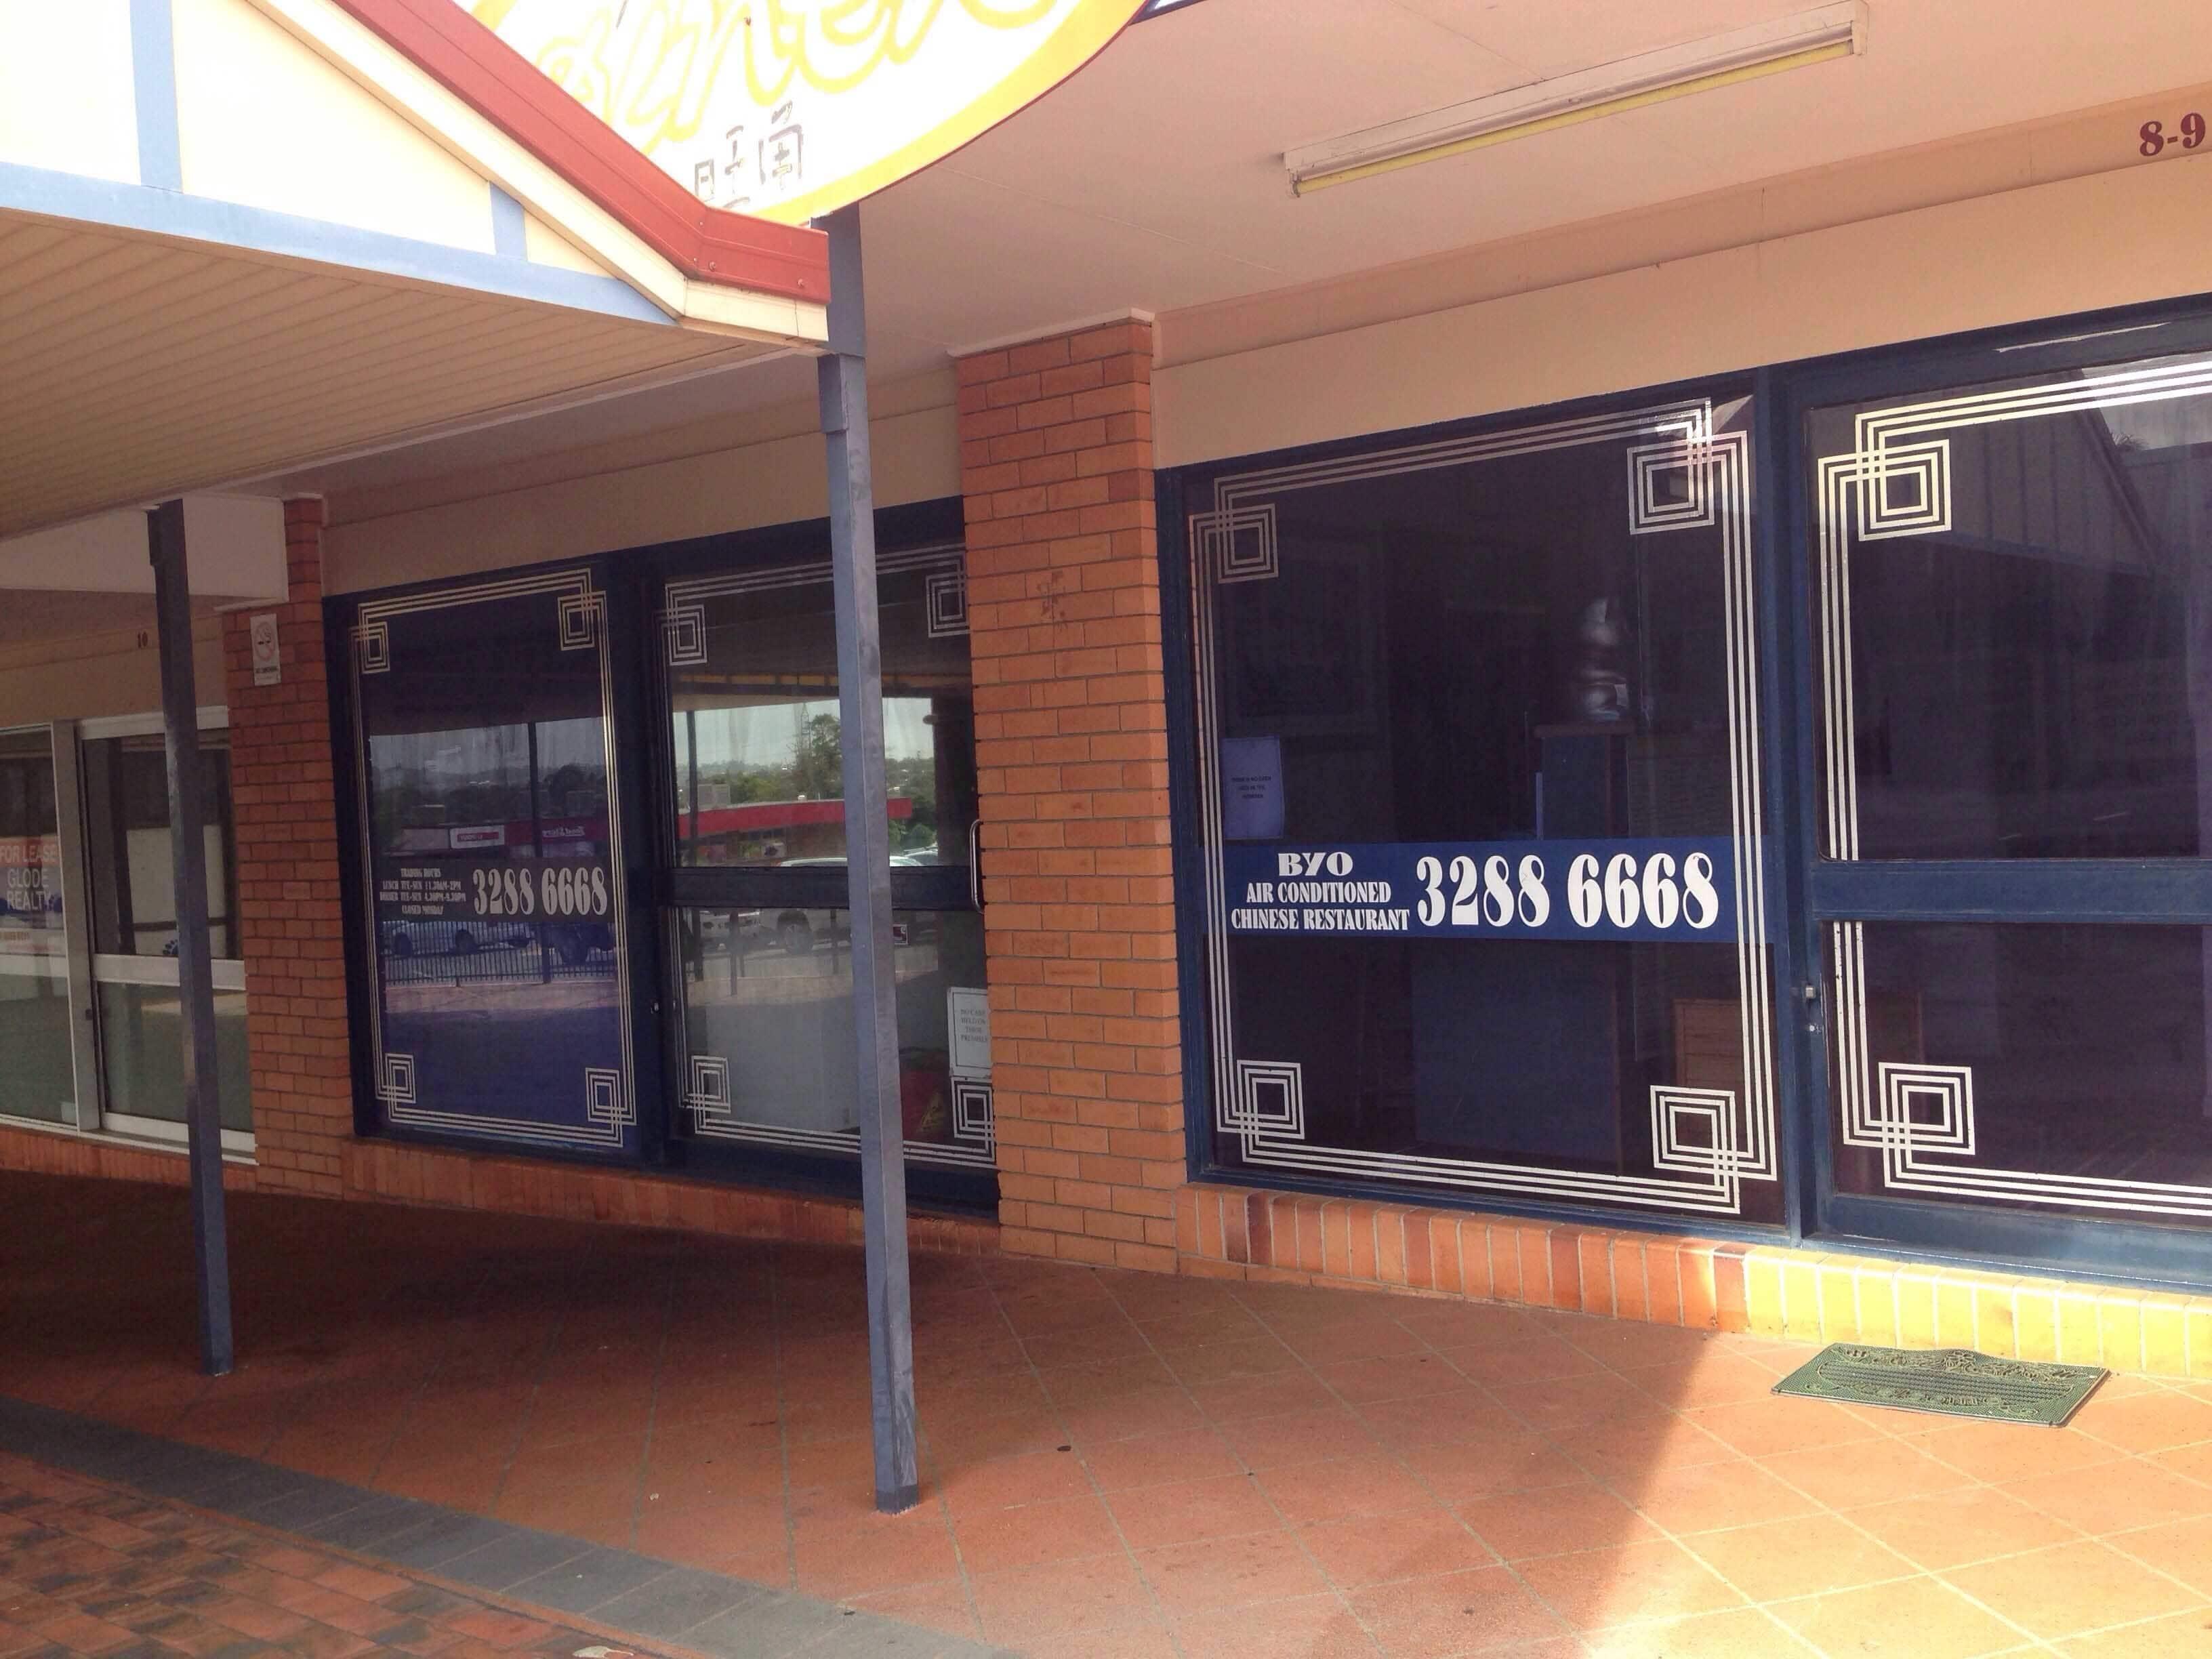 Dengs Diner Chinese Restaurant | Shop 8-9, 64 Raceview Street, Raceview, Queensland 4305 | +61 7 3288 6668